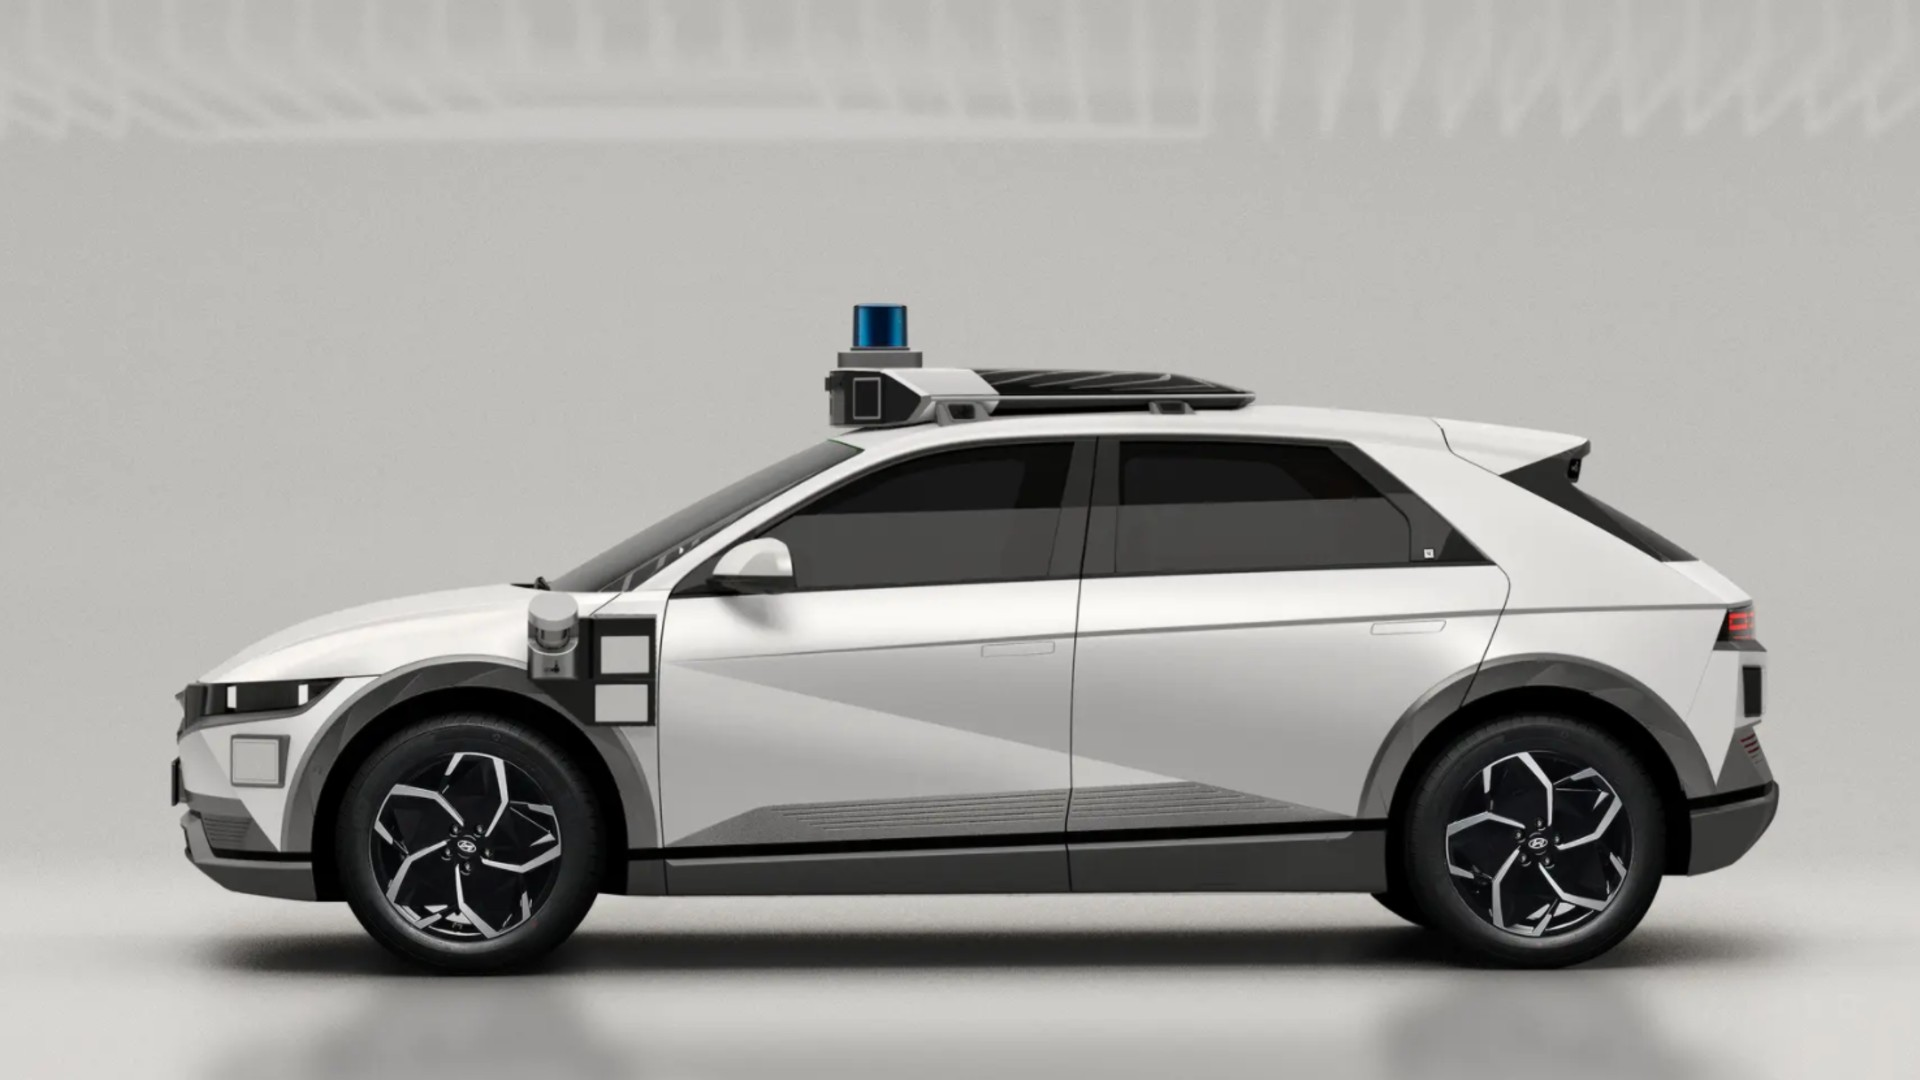 An image of a Motional robotaxi, built on a Hyundai Ioniq 5 motor vehicle platform. A lidar sensor system sits atop the car.(Motional)